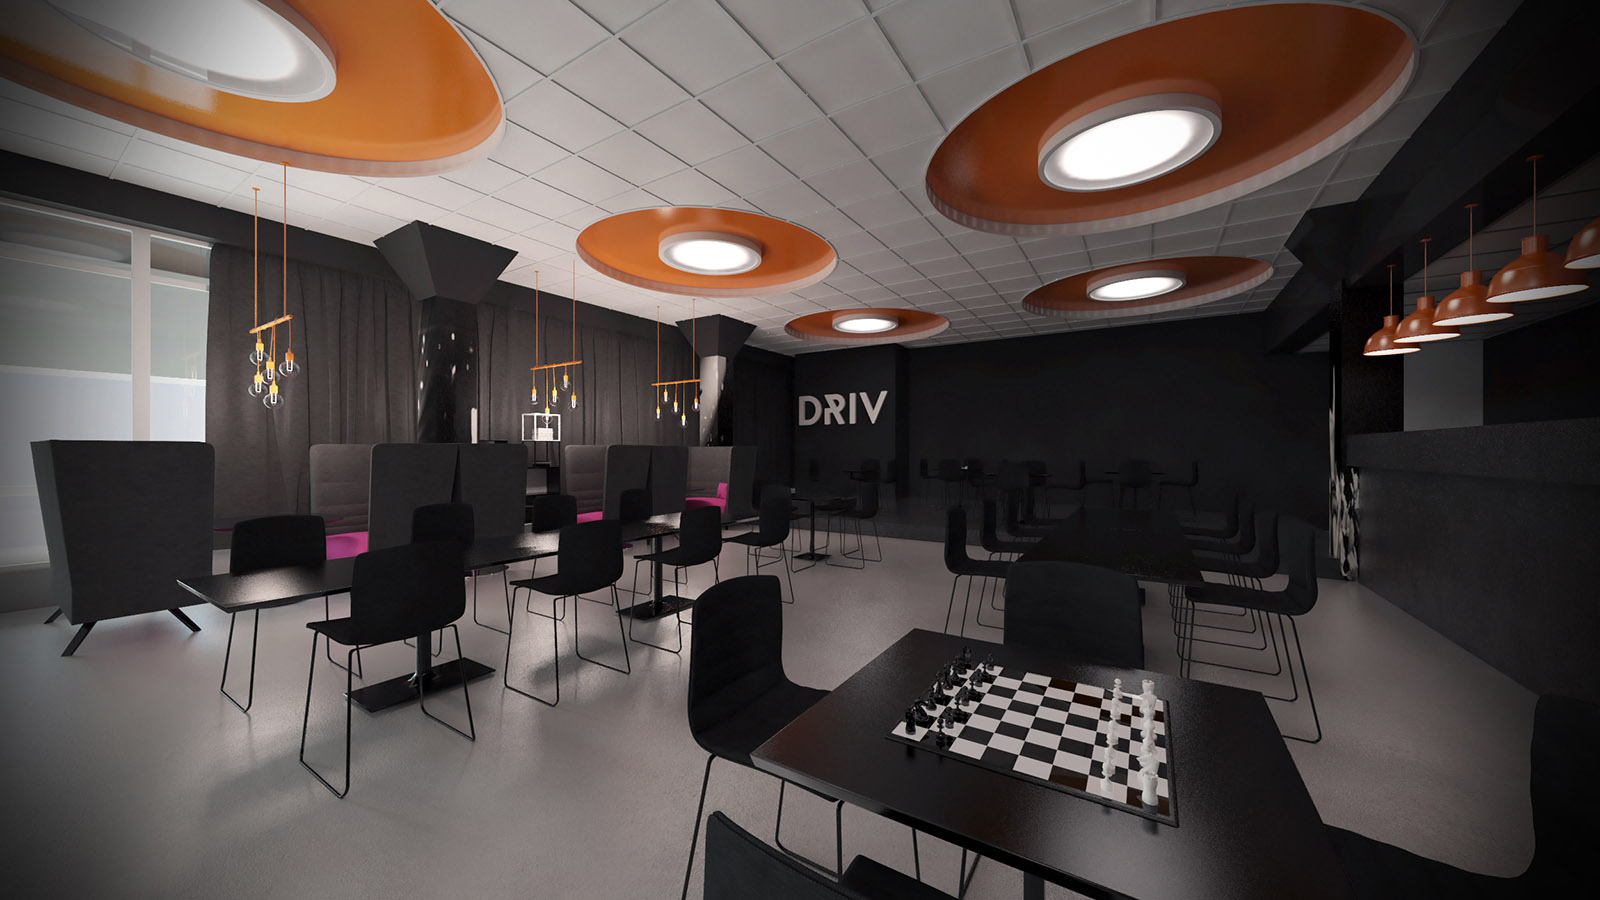 Driv_student_club_04.jpg